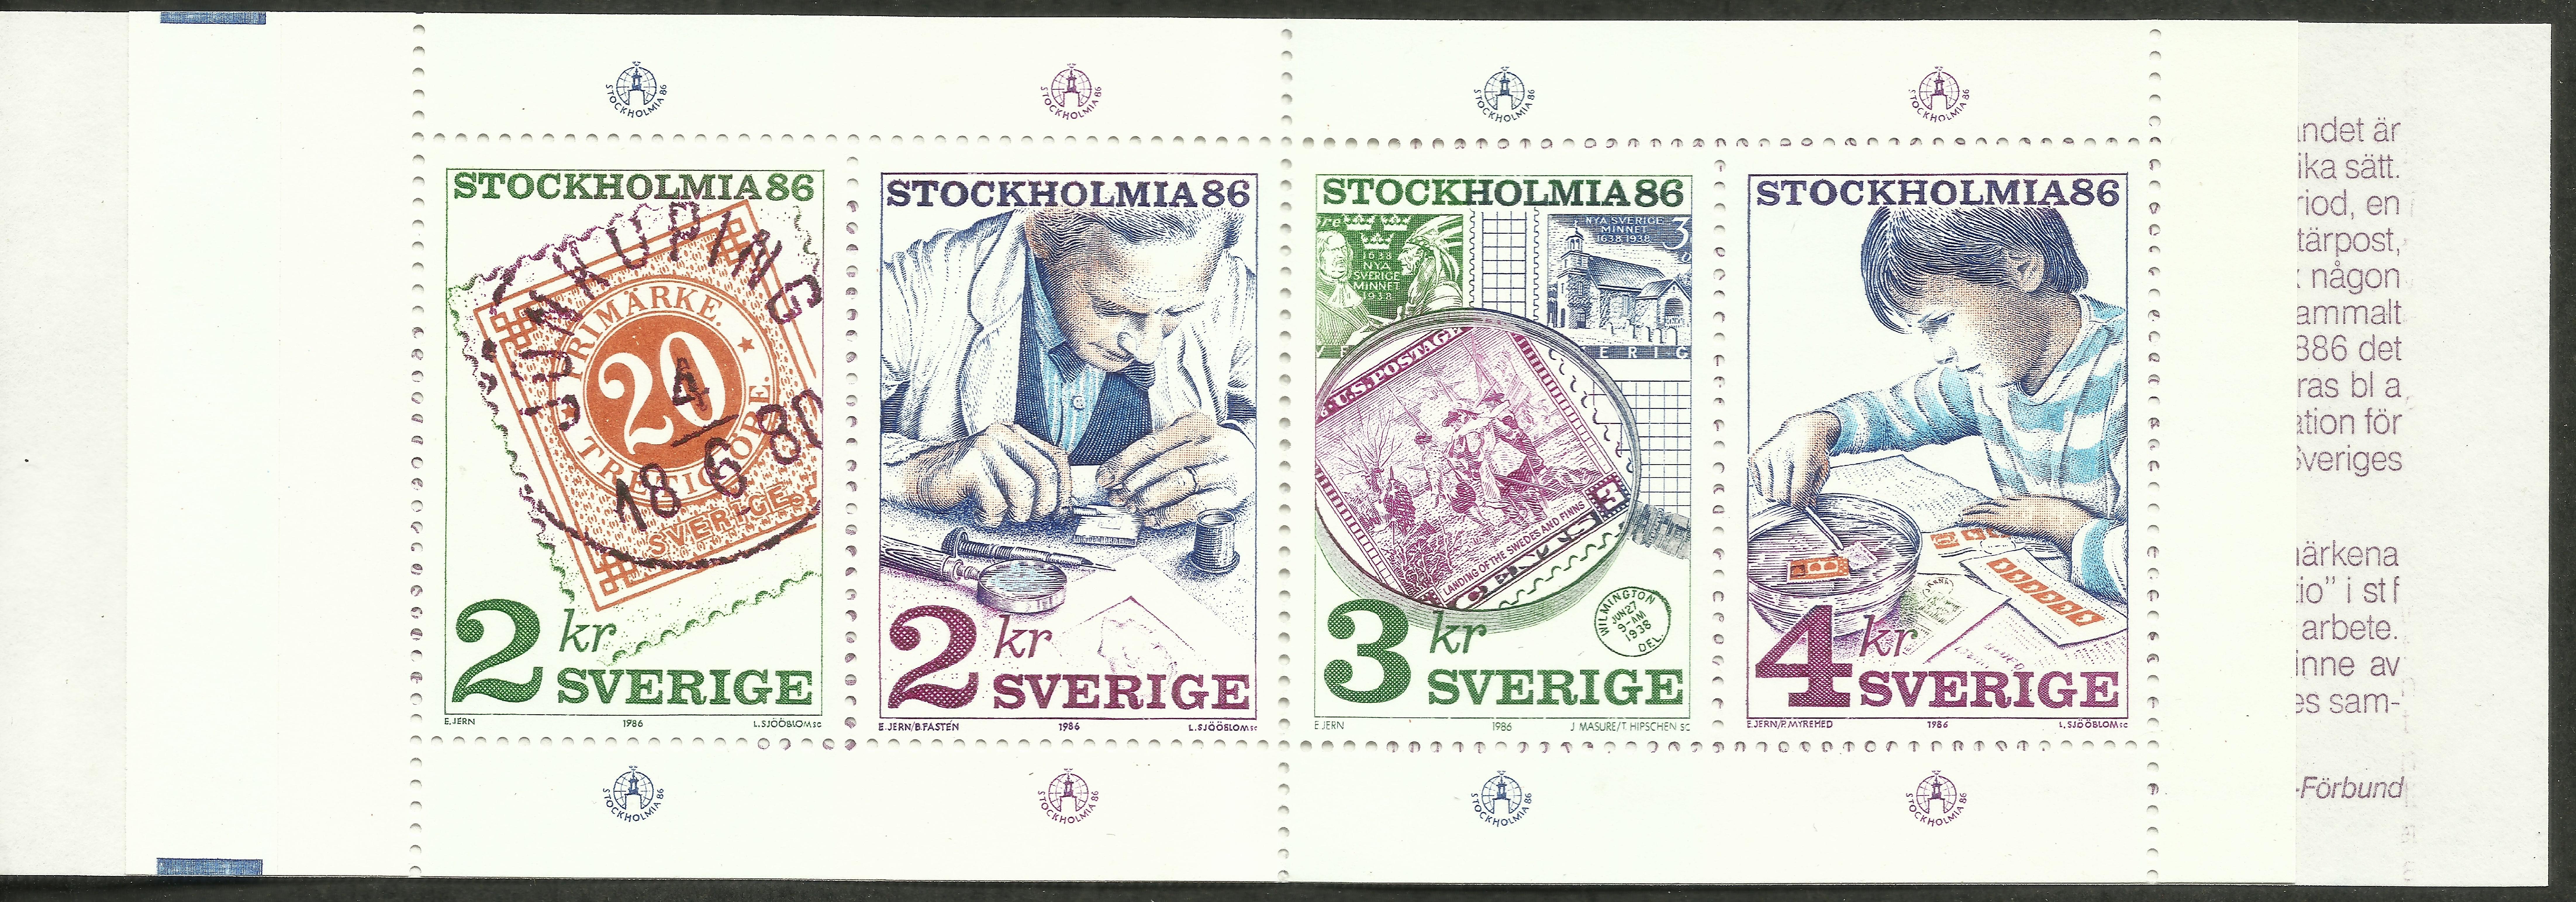 Sweden - Scott #1588a (1986) booklet pane